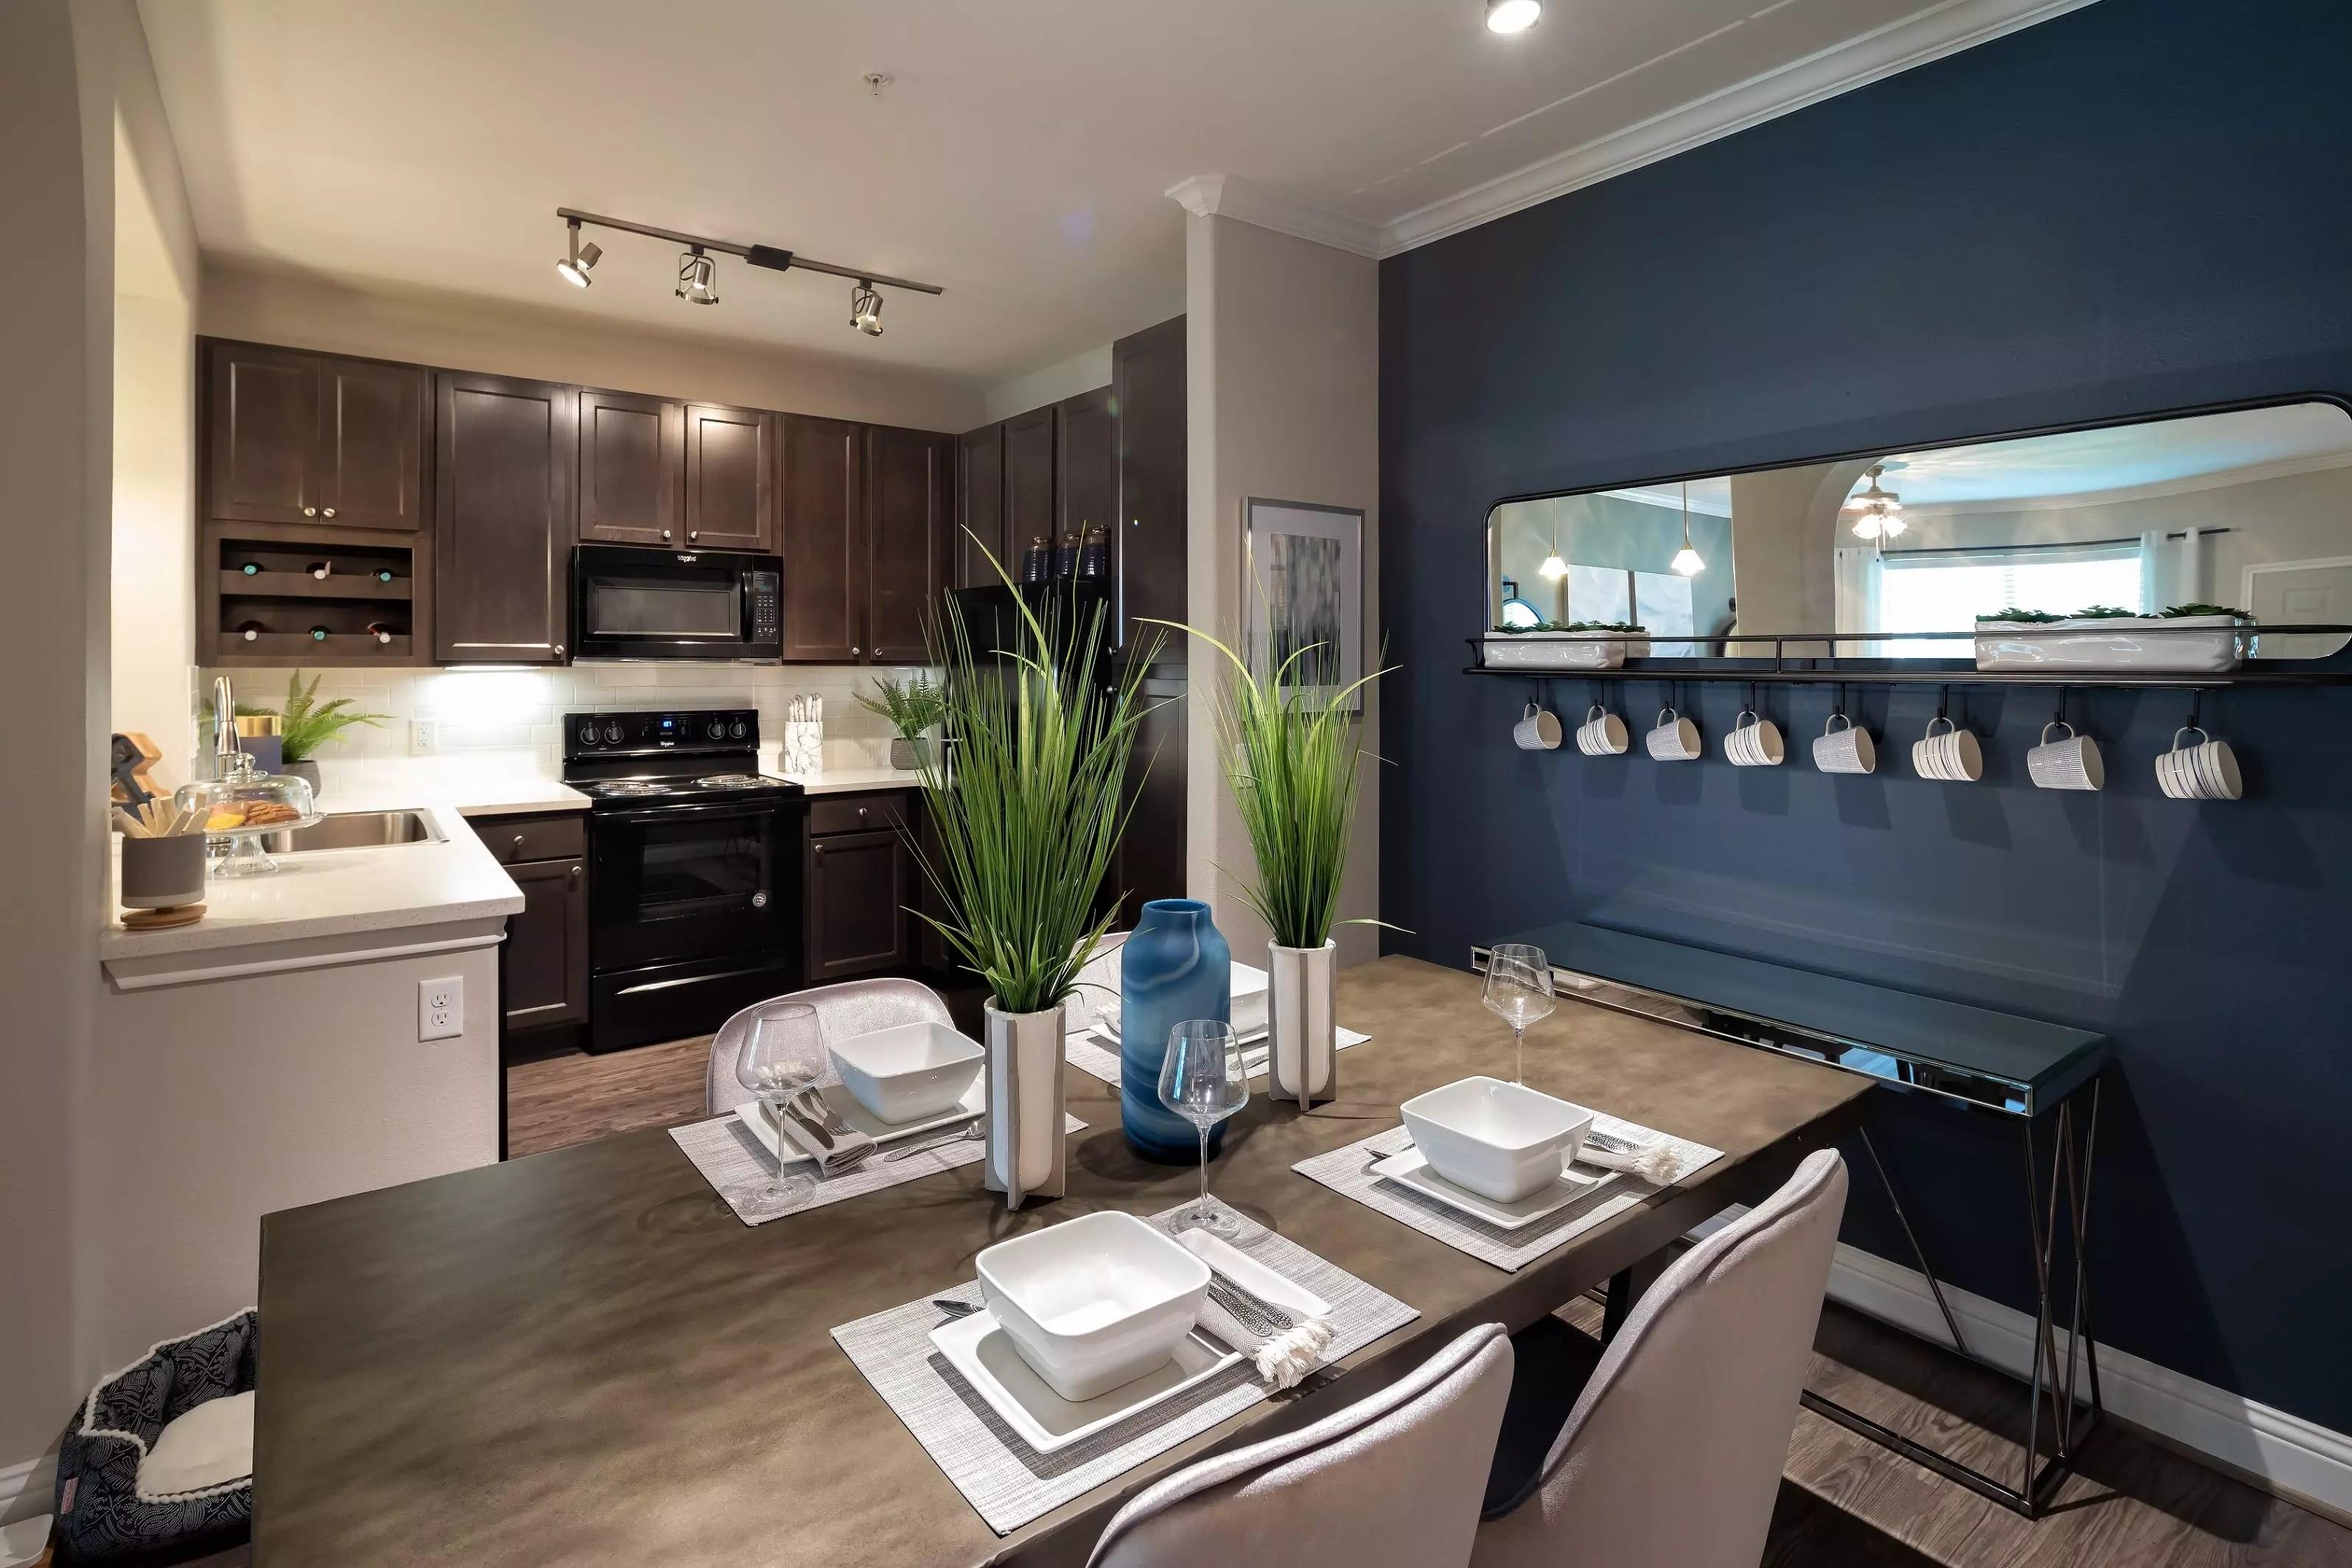 Luxury 1, 2 & 3 Bedroom Apartments in Katy, TX